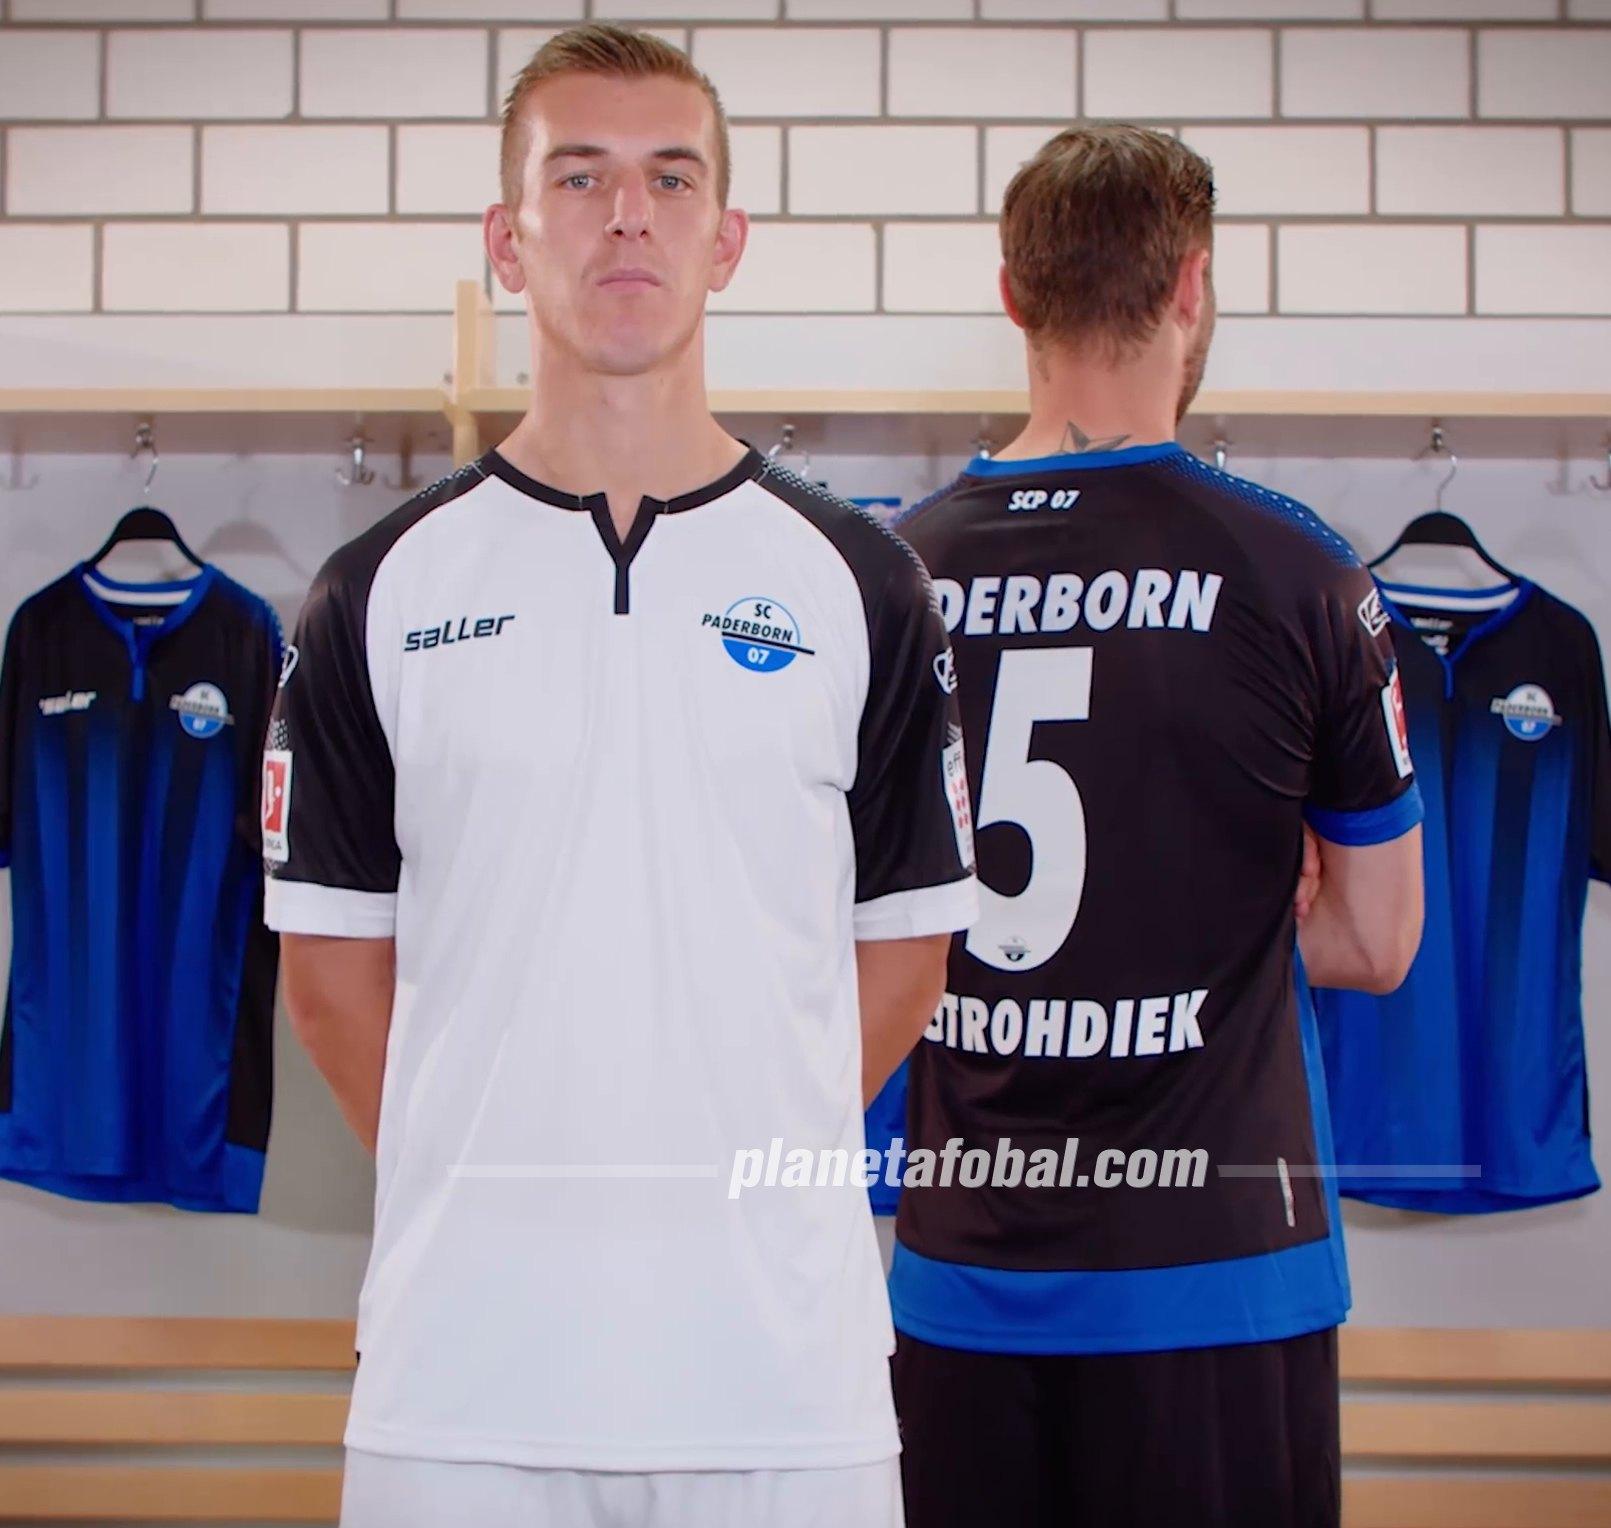 Camisetas Saller del SC Paderborn 07 2019/20